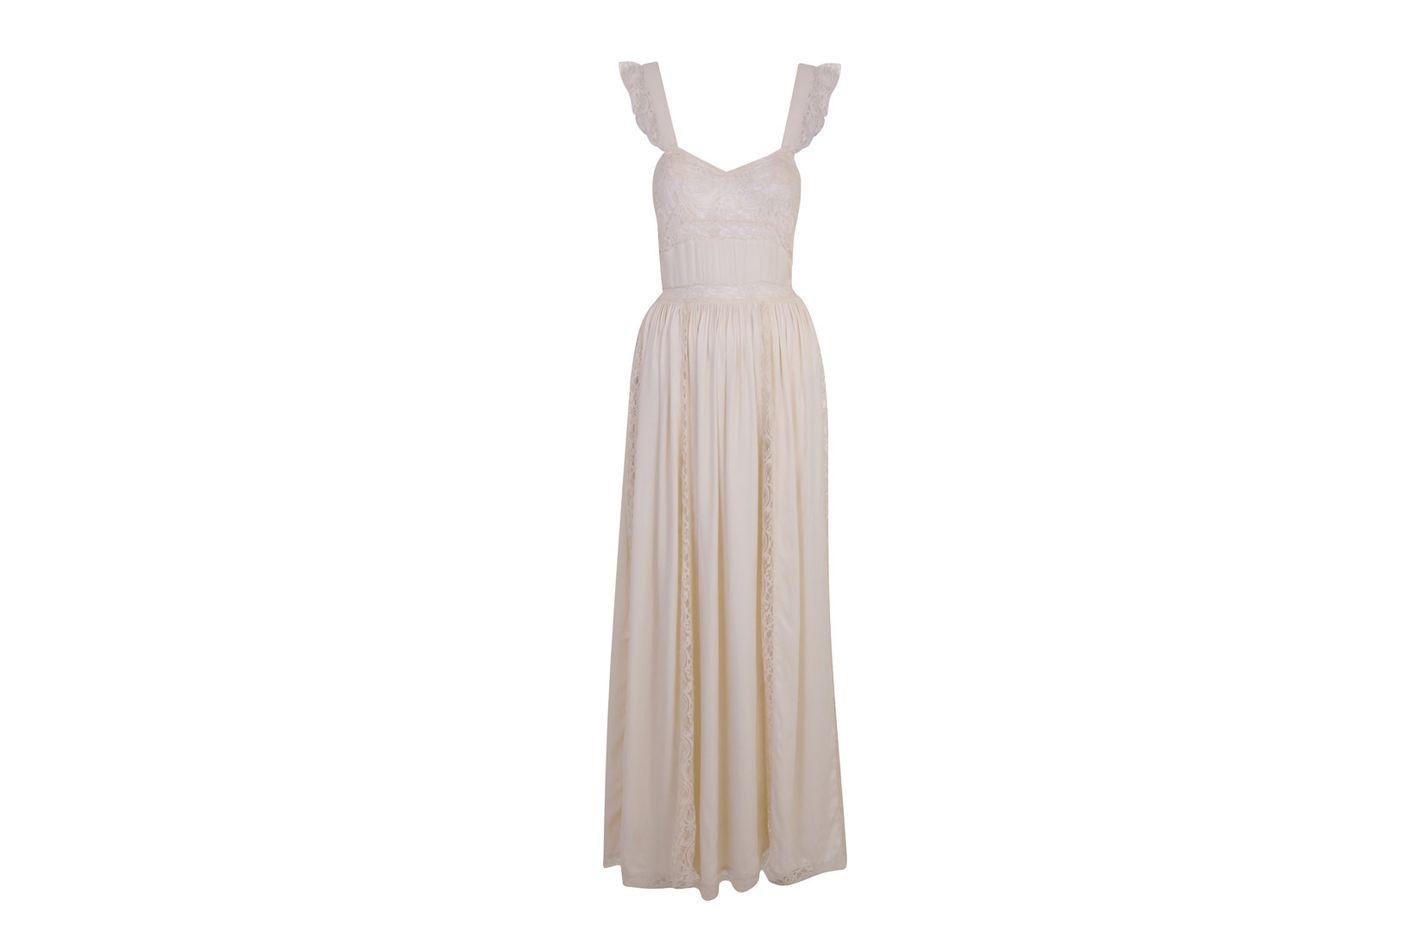 Satin Lace Maxi Dress